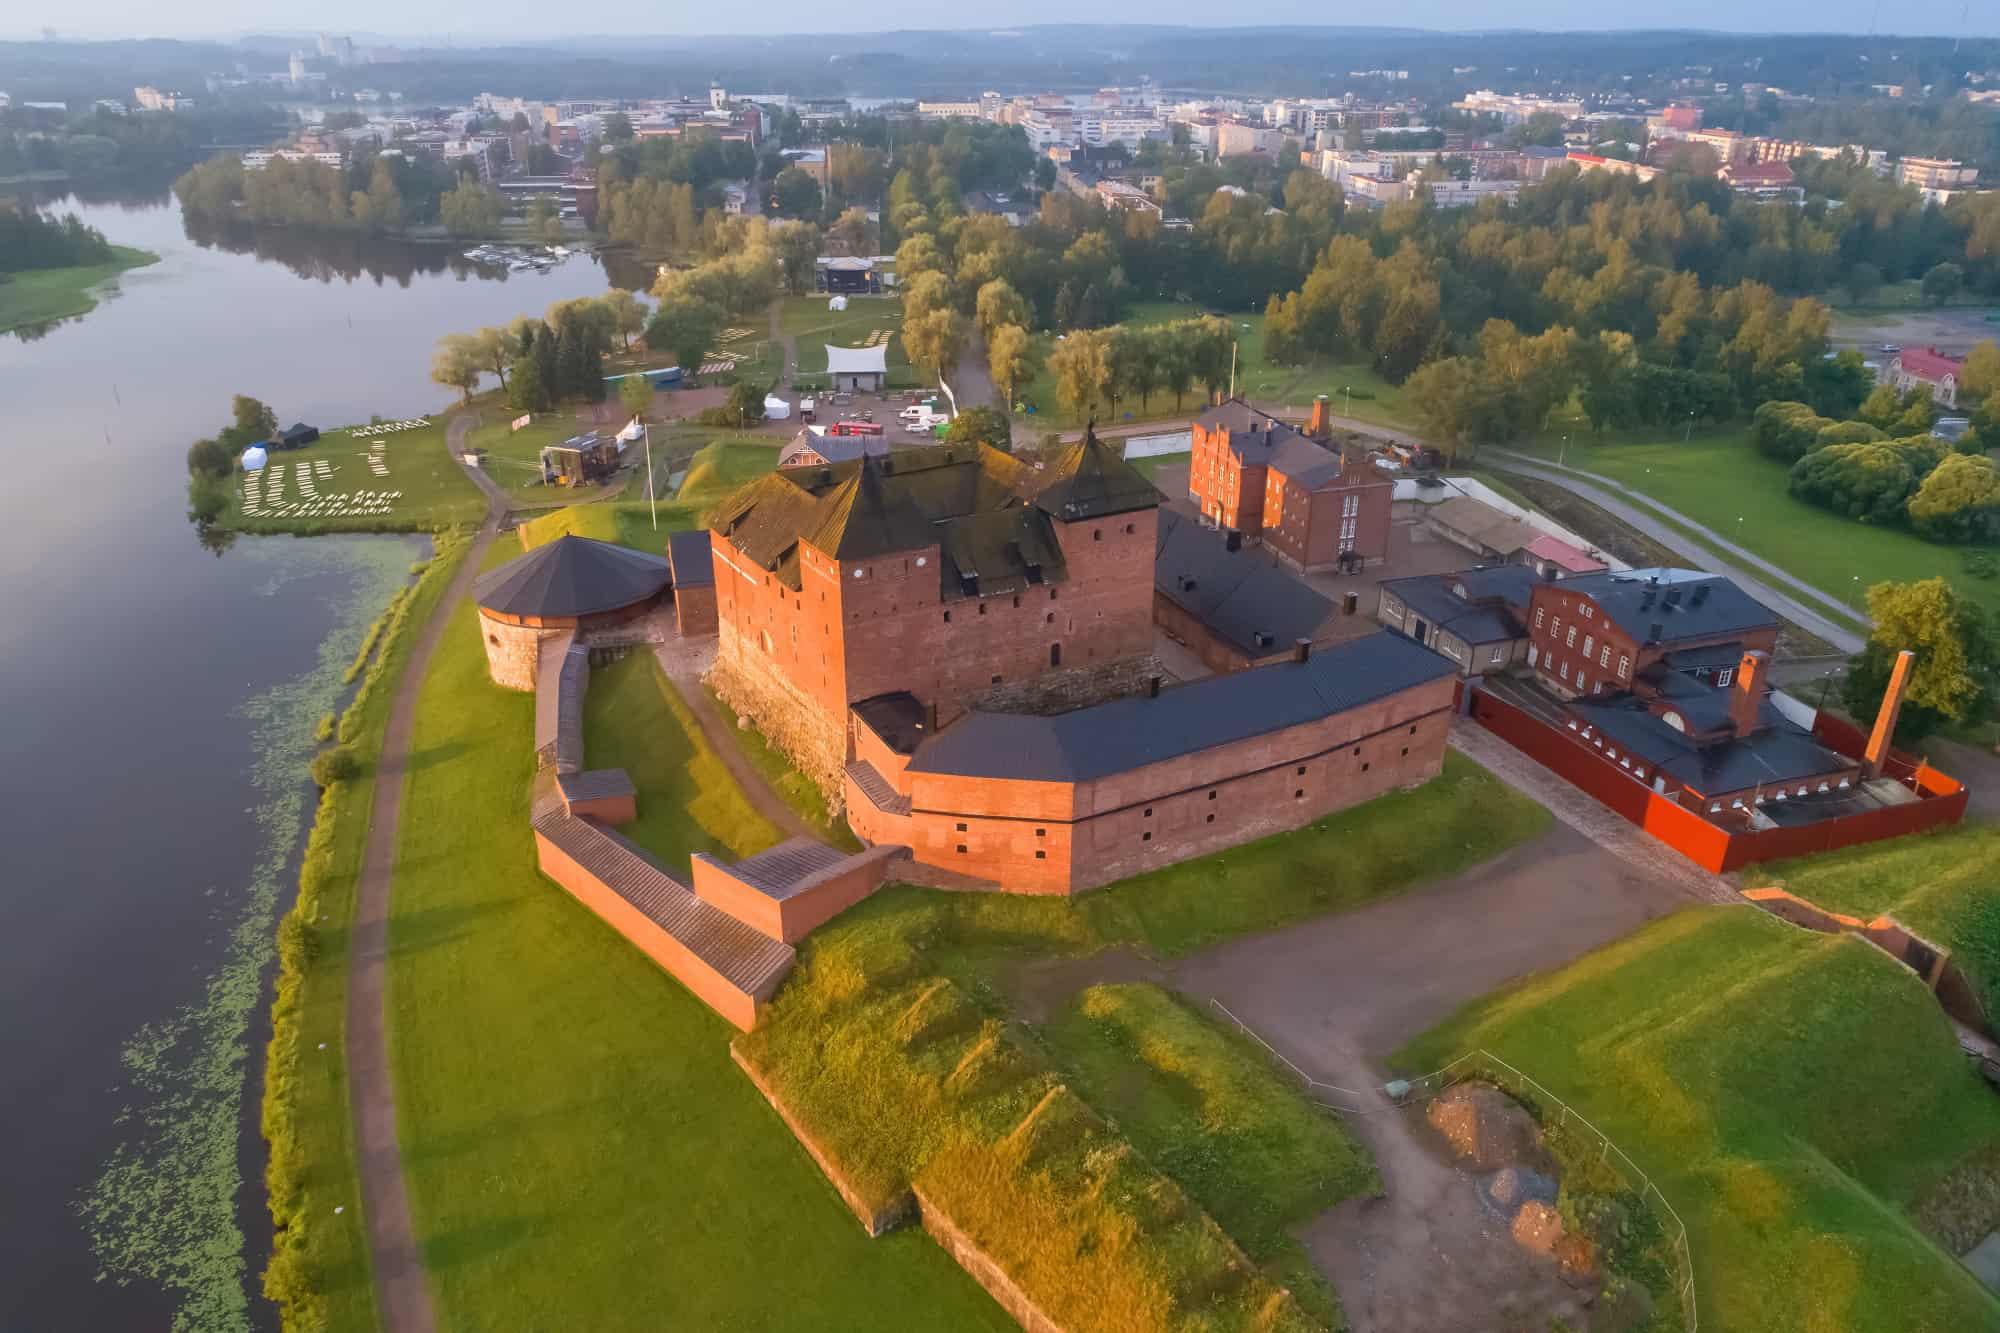 Hameenlinna Finland Day Trip from Helsinki